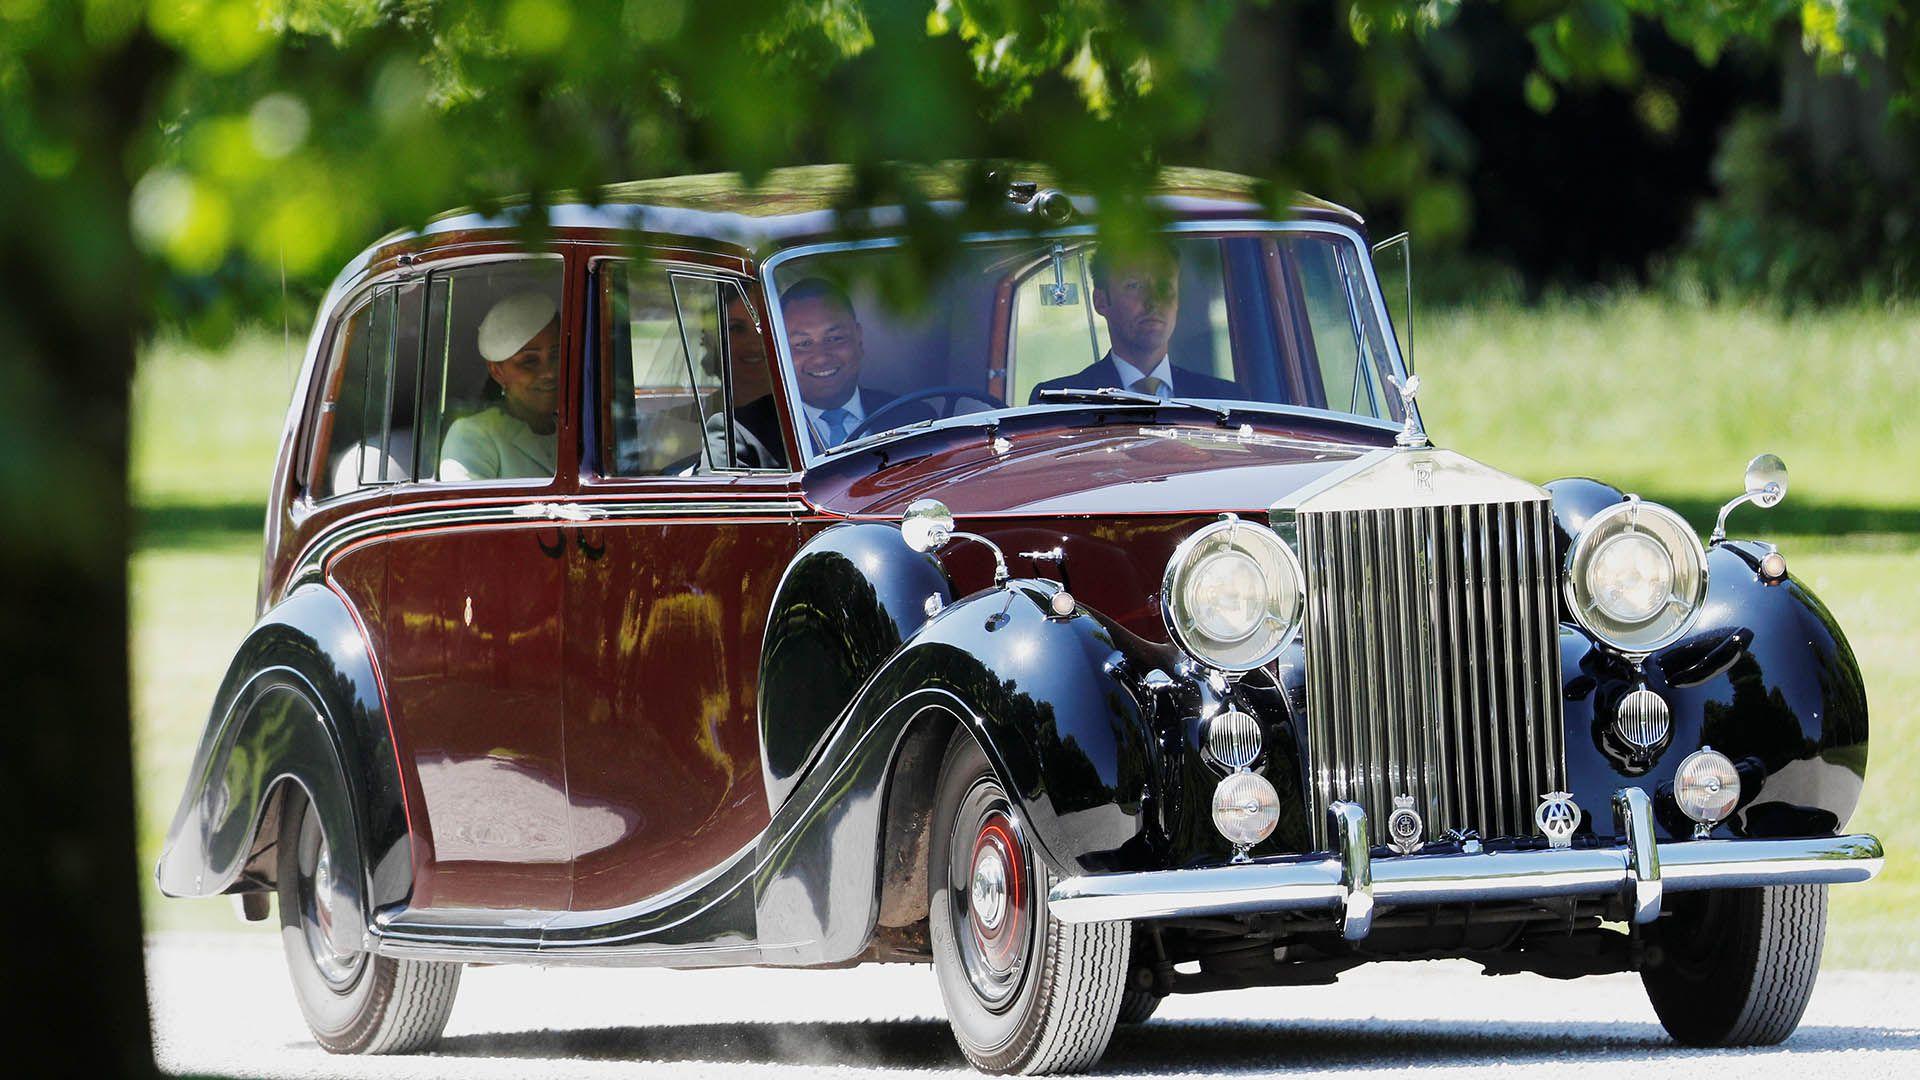 Meghan Markle llegó en un Rolls Royce Phantom IV, junto con su madre, Doria Ragland (Reuters)